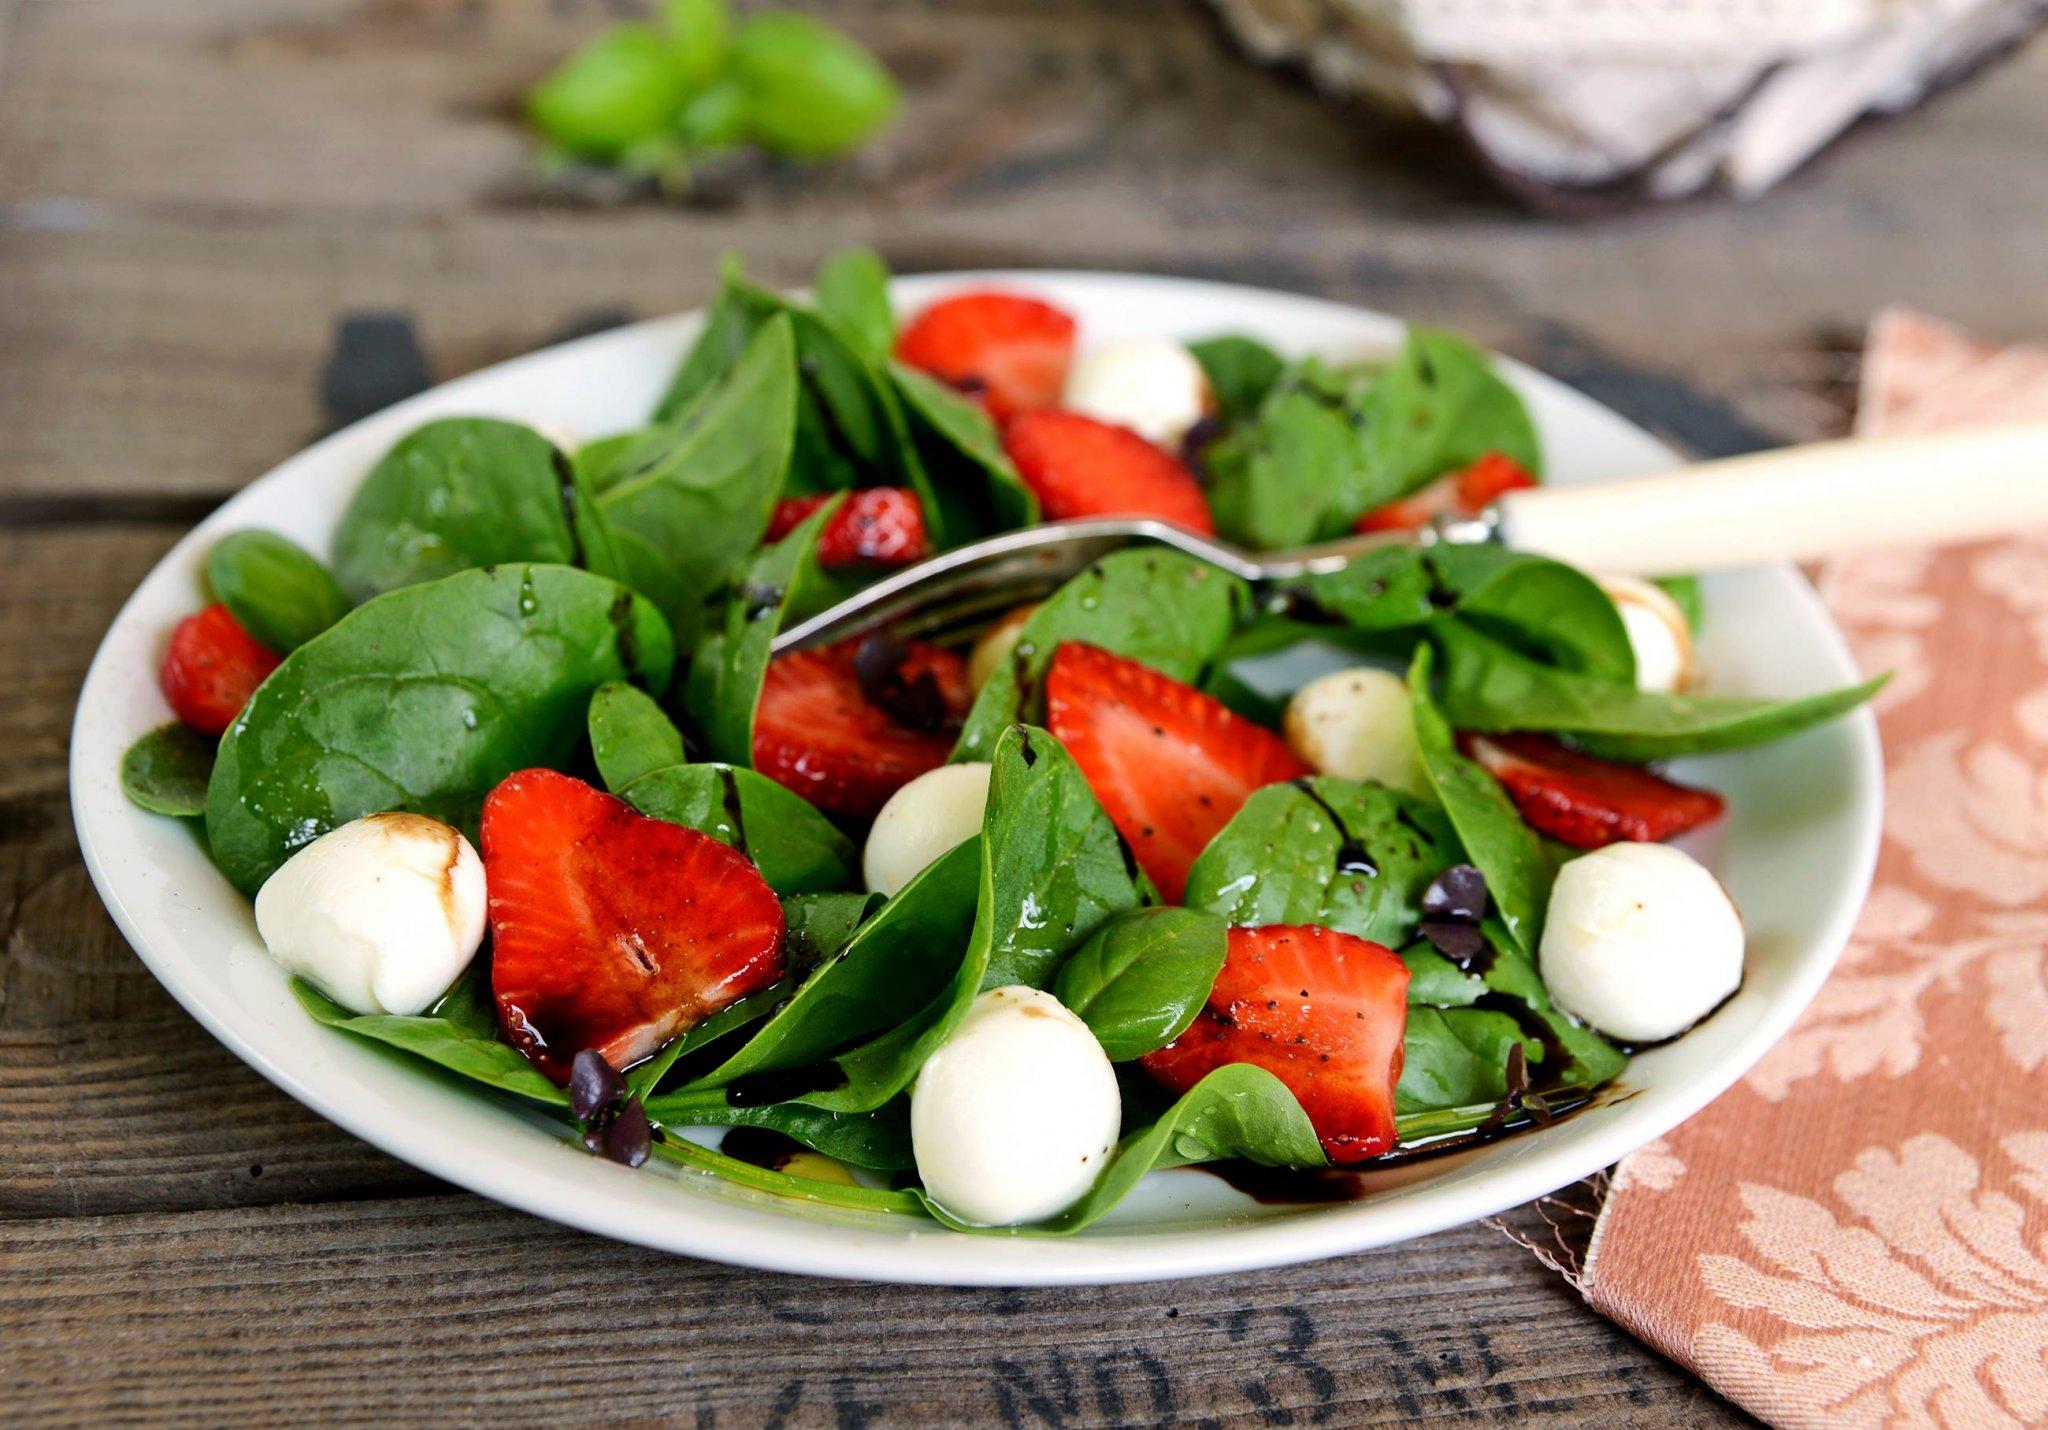 eper-spenot salata2